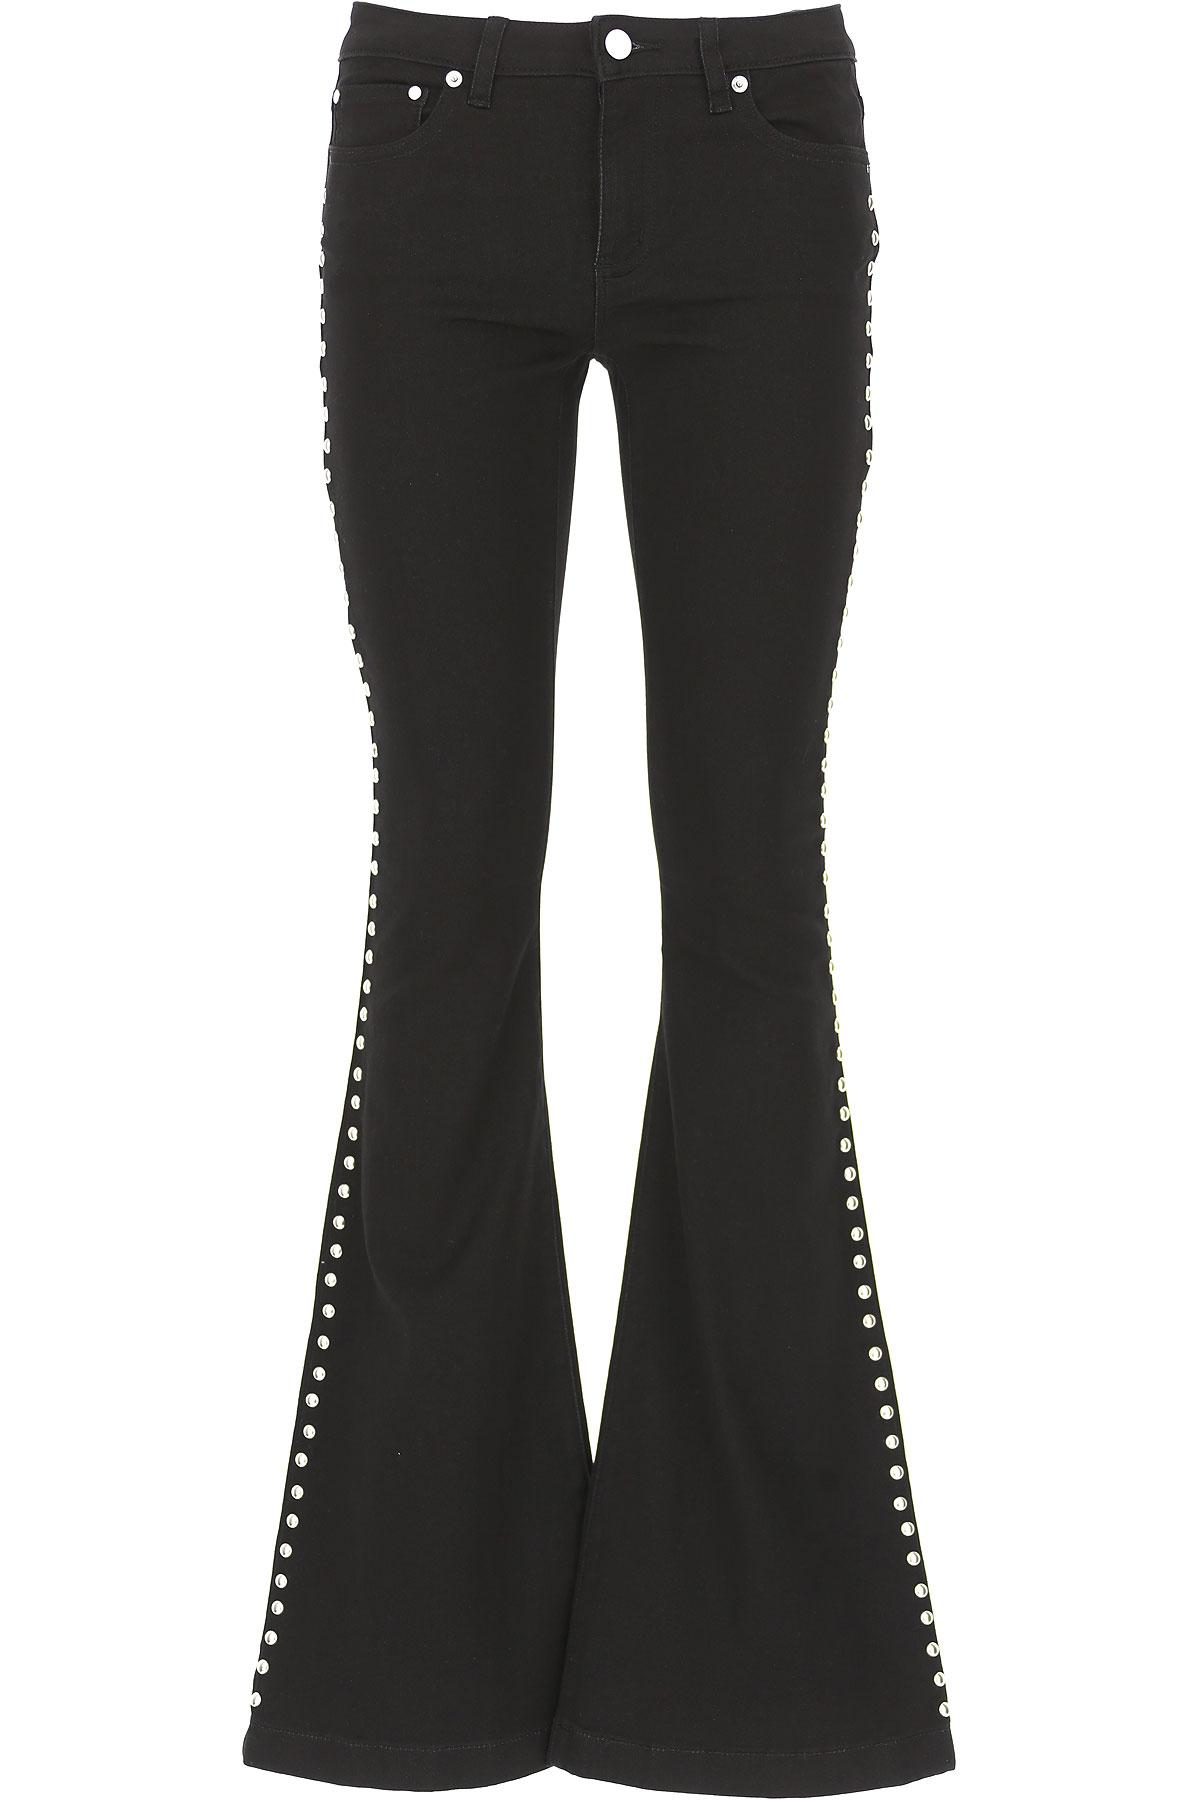 Michael Kors Jeans, Black, Cotton, 2017, 26 28 USA-473391